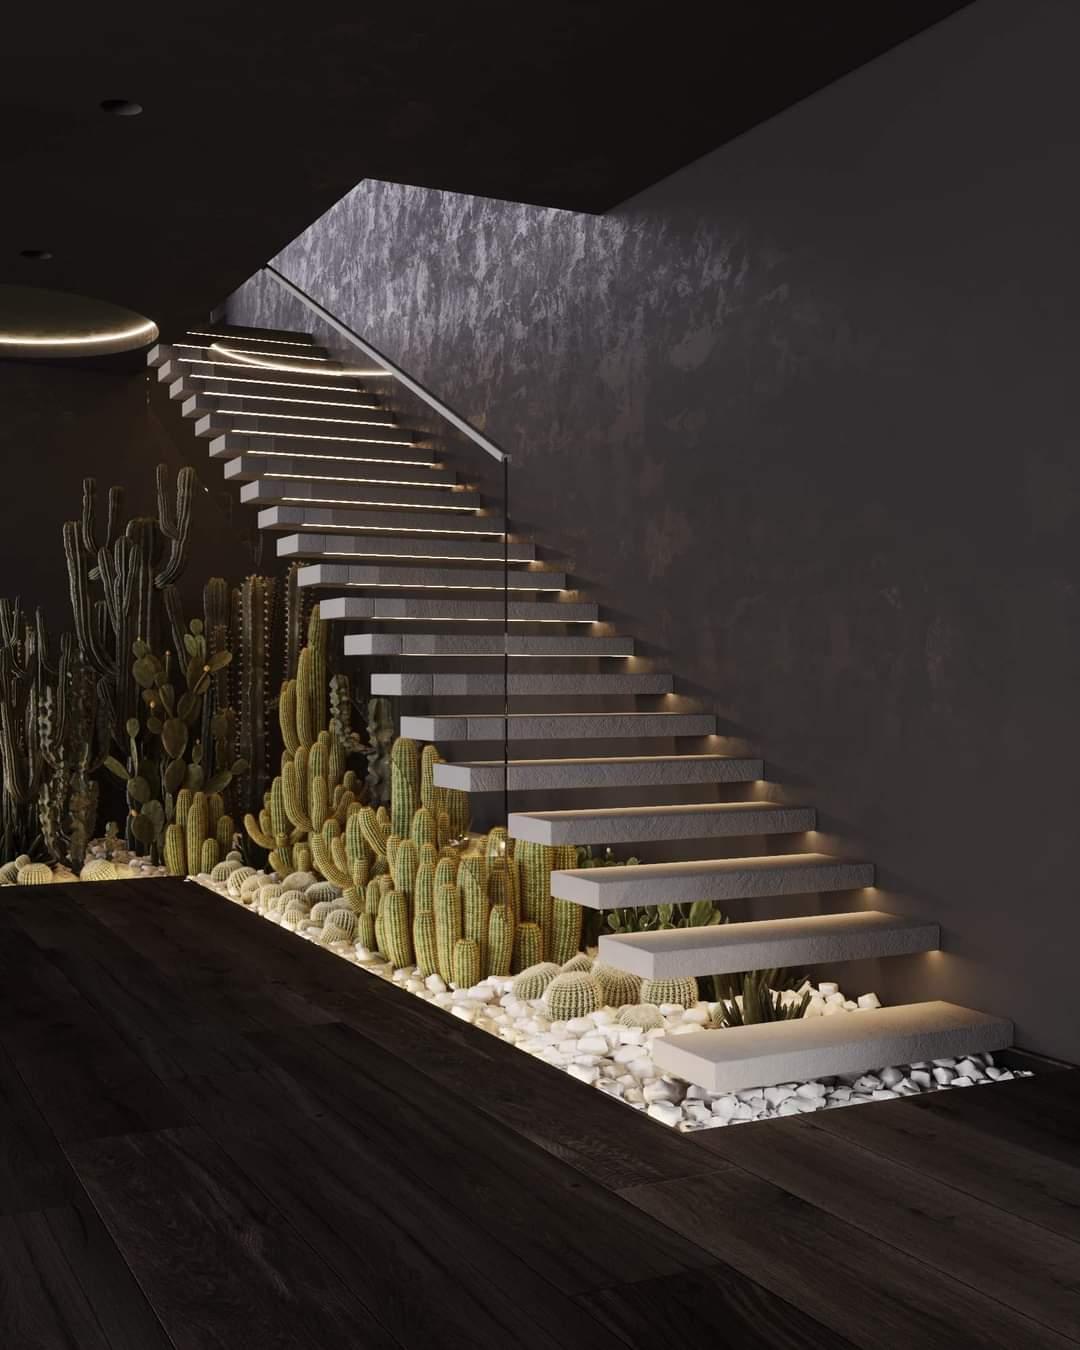 Enchanting Staircase - Source: Kireevaaanna